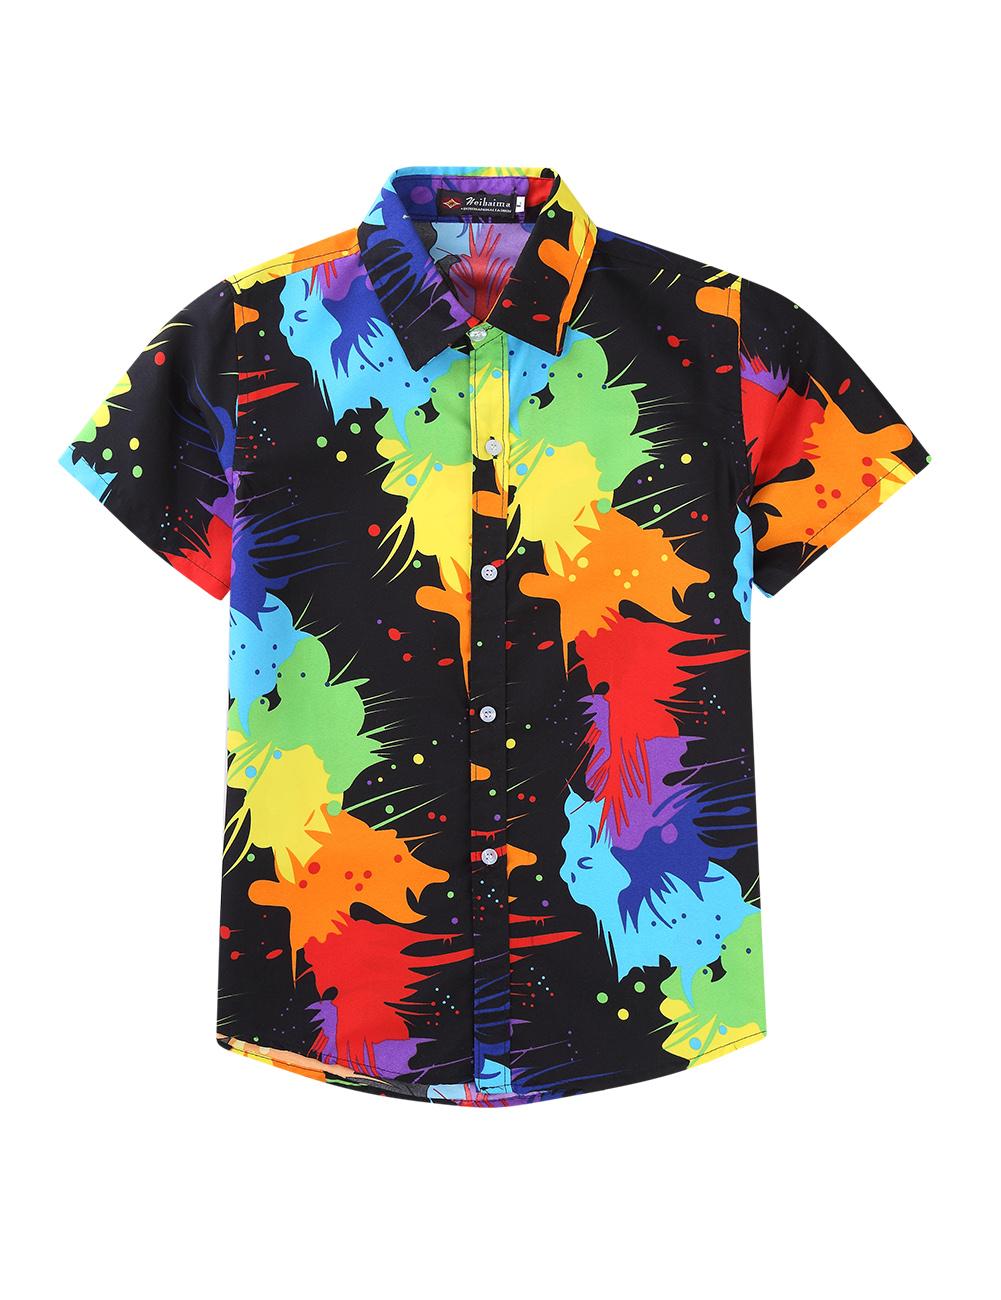 Men Women Cool Printing Beach Hawaii Couples Shirt 18#_XL